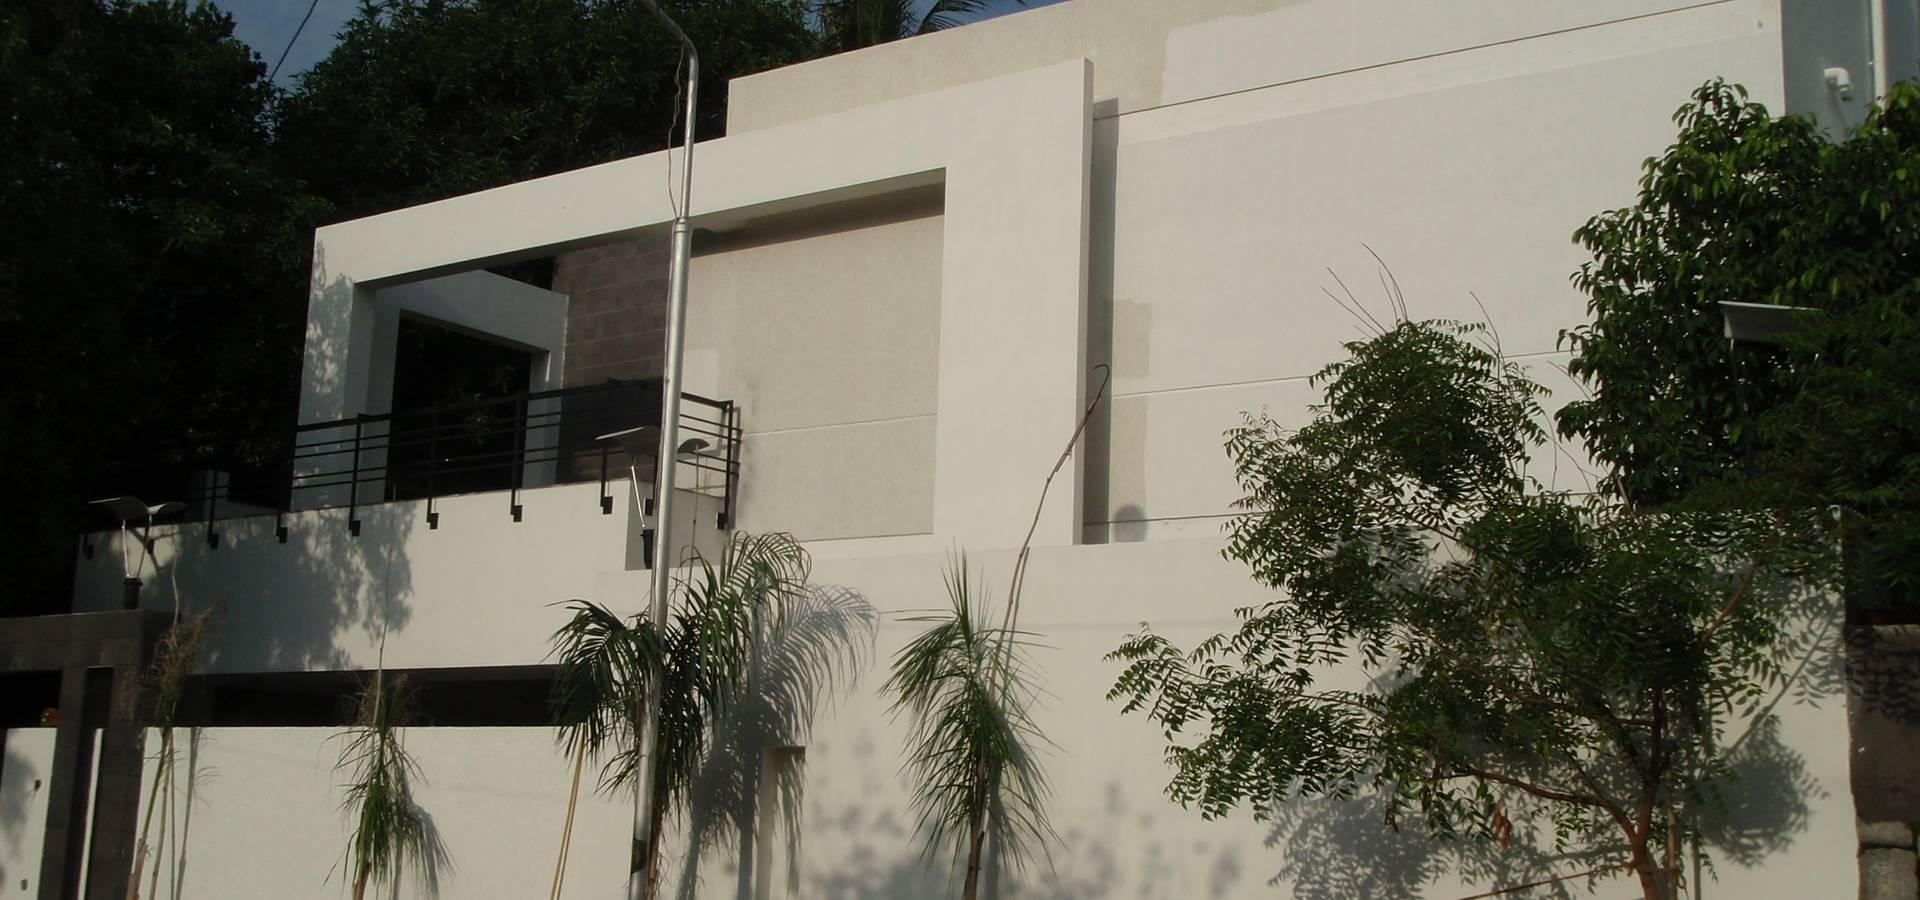 Sahana's Creations Architects and Interior Designers